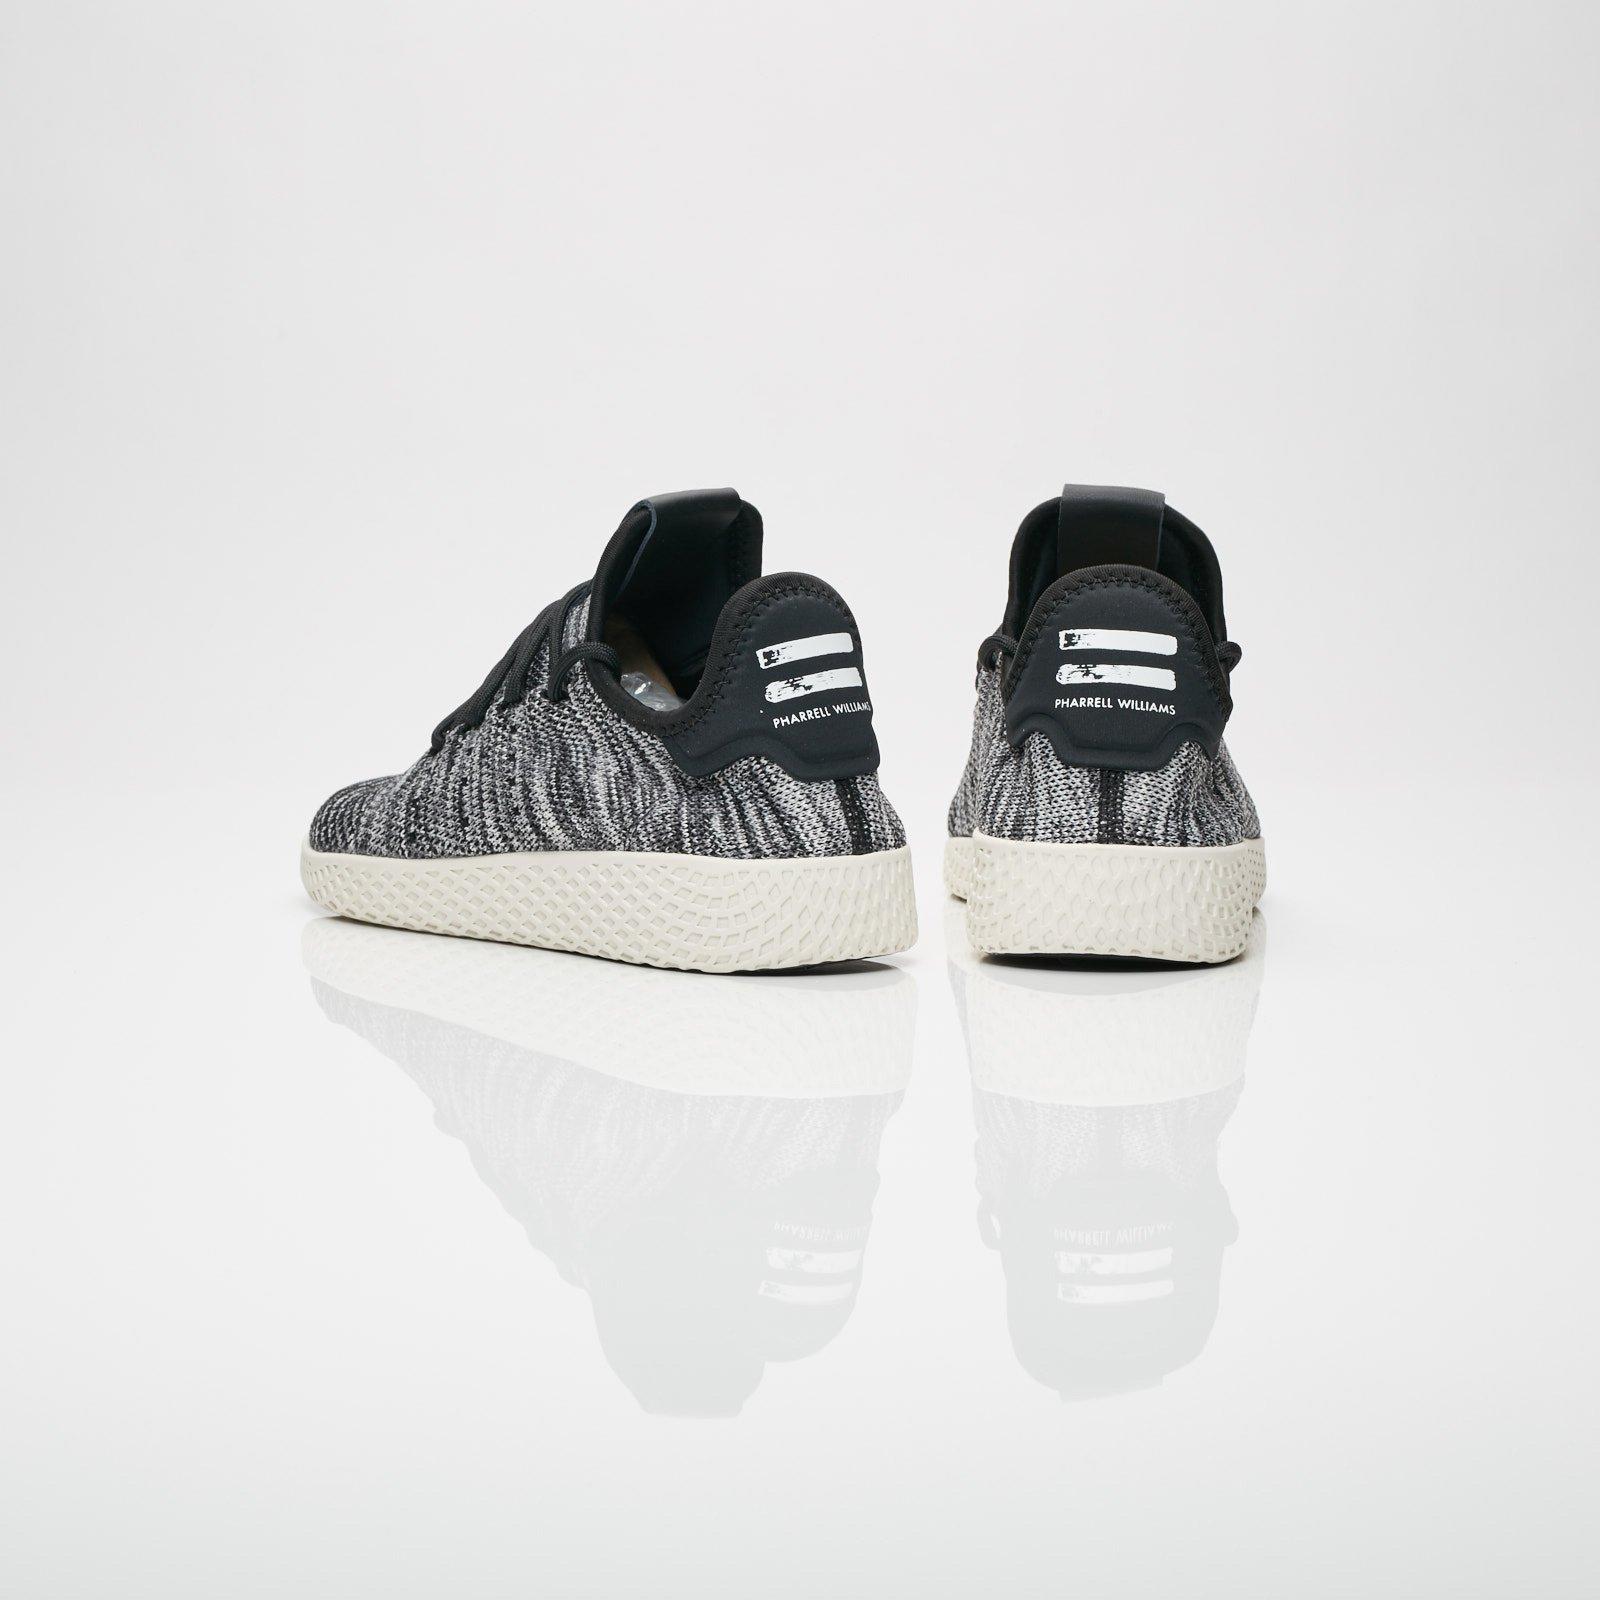 37347607d adidas Pharrell Williams Tennis HU PK - Cq2630 - Sneakersnstuff ...